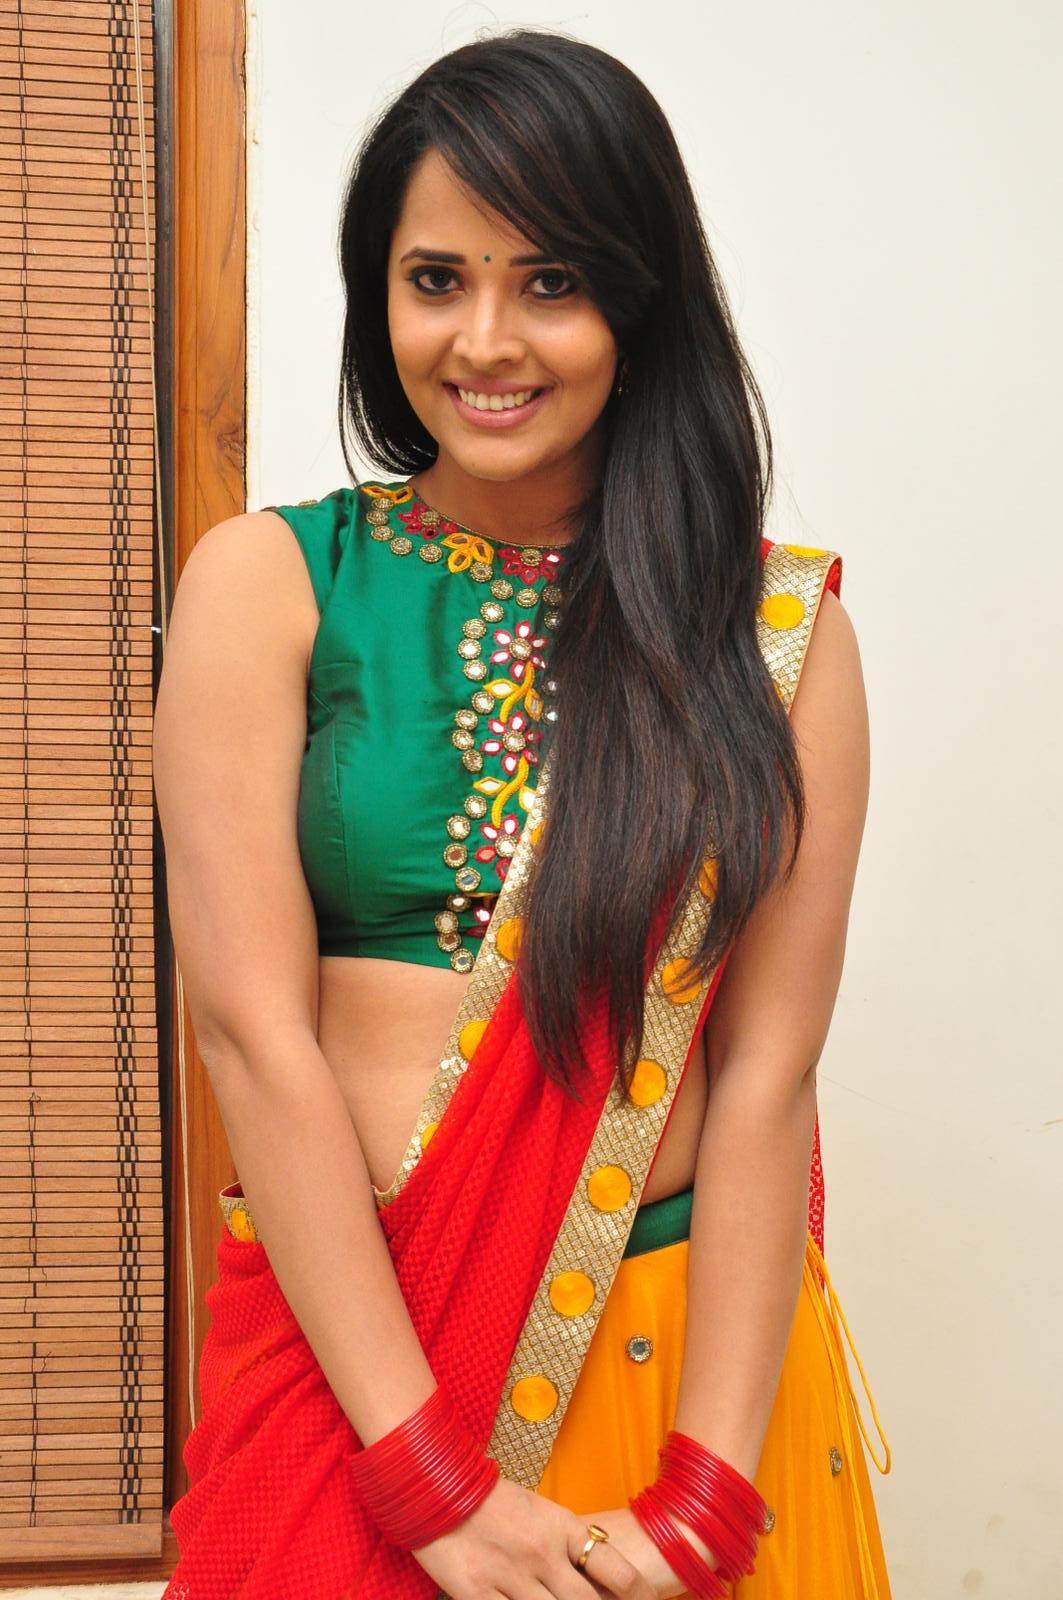 TV Anchor Anasuya In Red Dress At Telugu Film Audio Launch